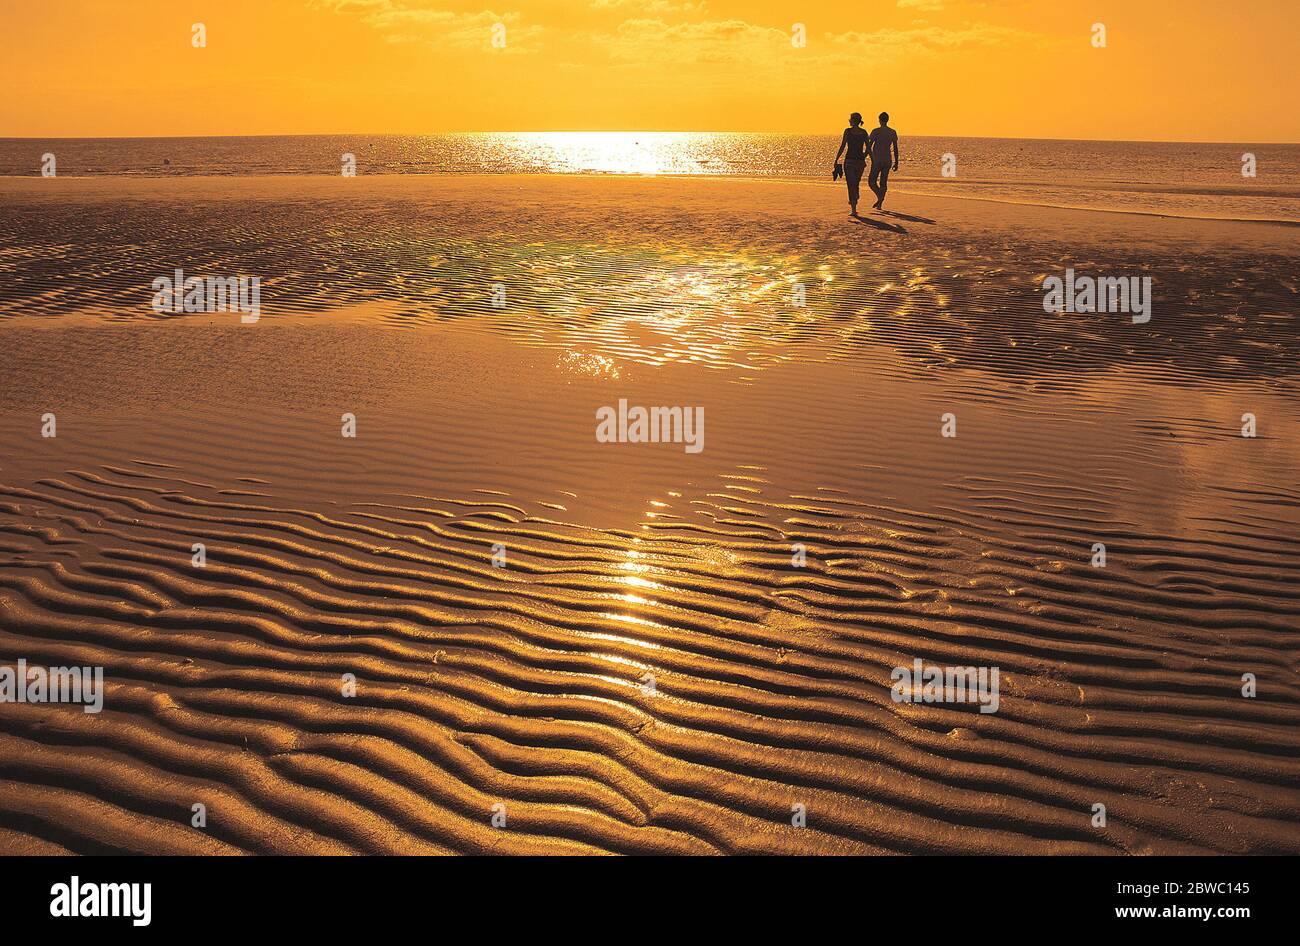 Paar wandert bei Ebbe am Strand, Sonnenuntergang, MR: SÌ Foto Stock